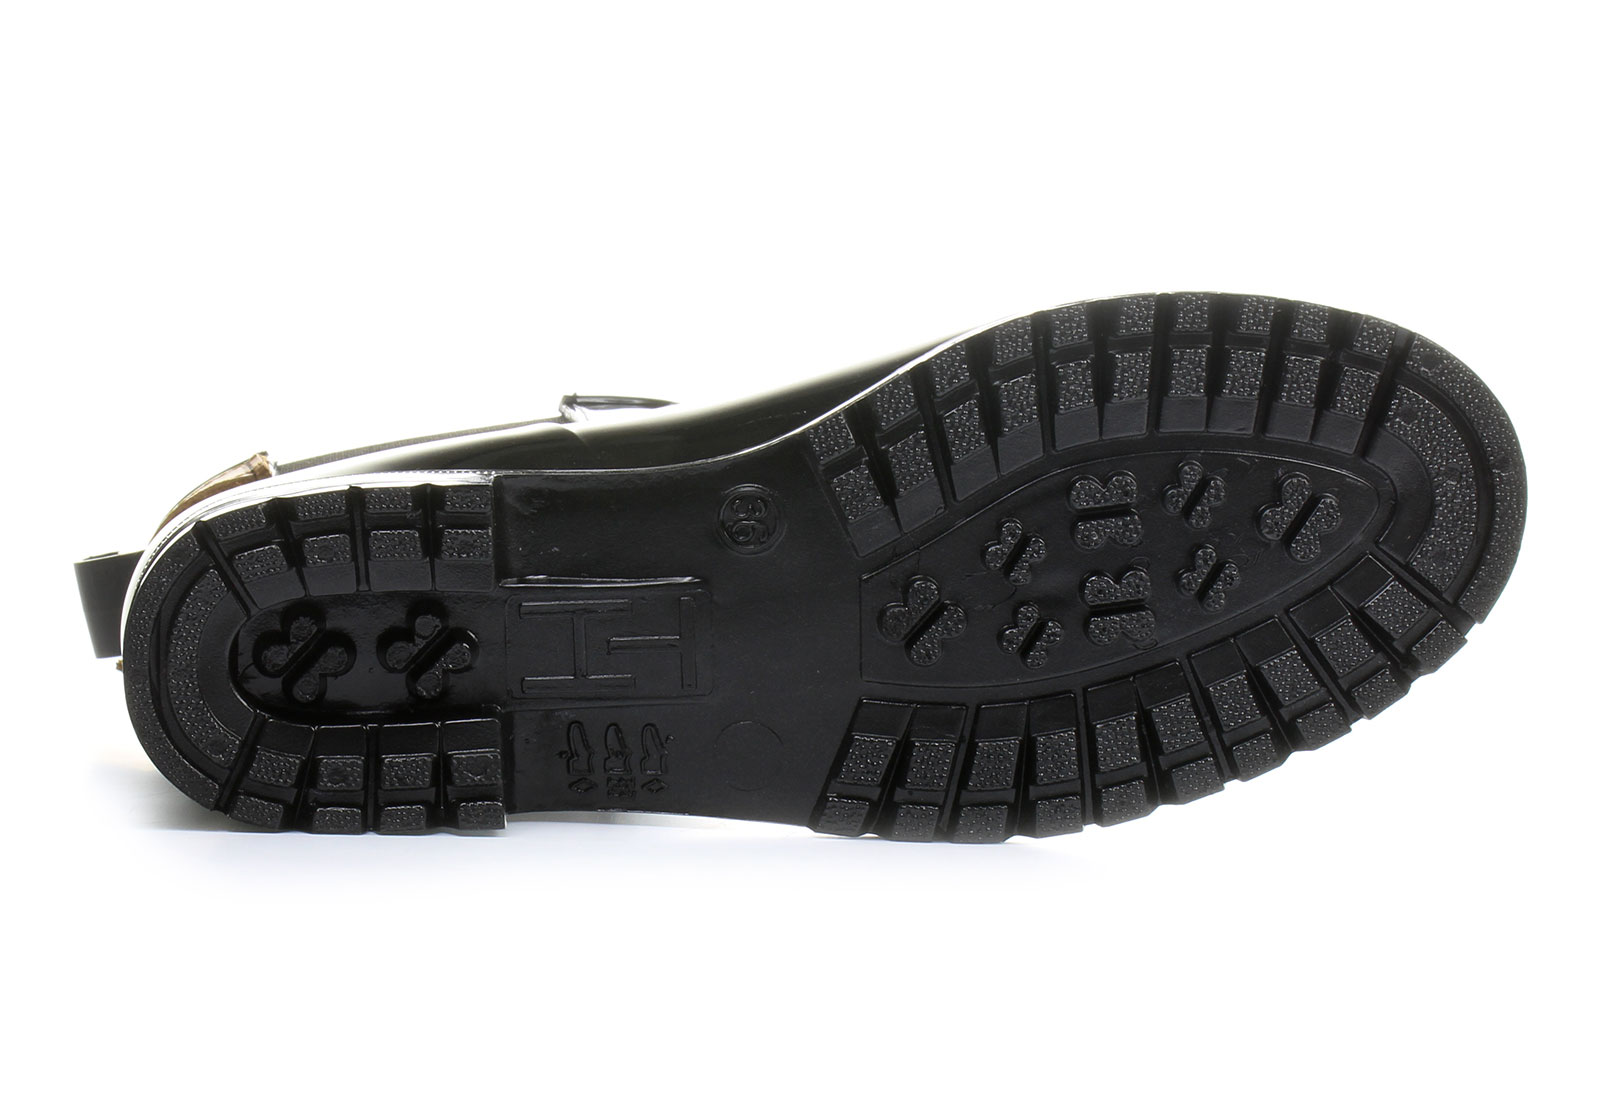 591ce38f90 Tommy Hilfiger Gumene Crna Čizme - Oxley - Office Shoes - Online ...